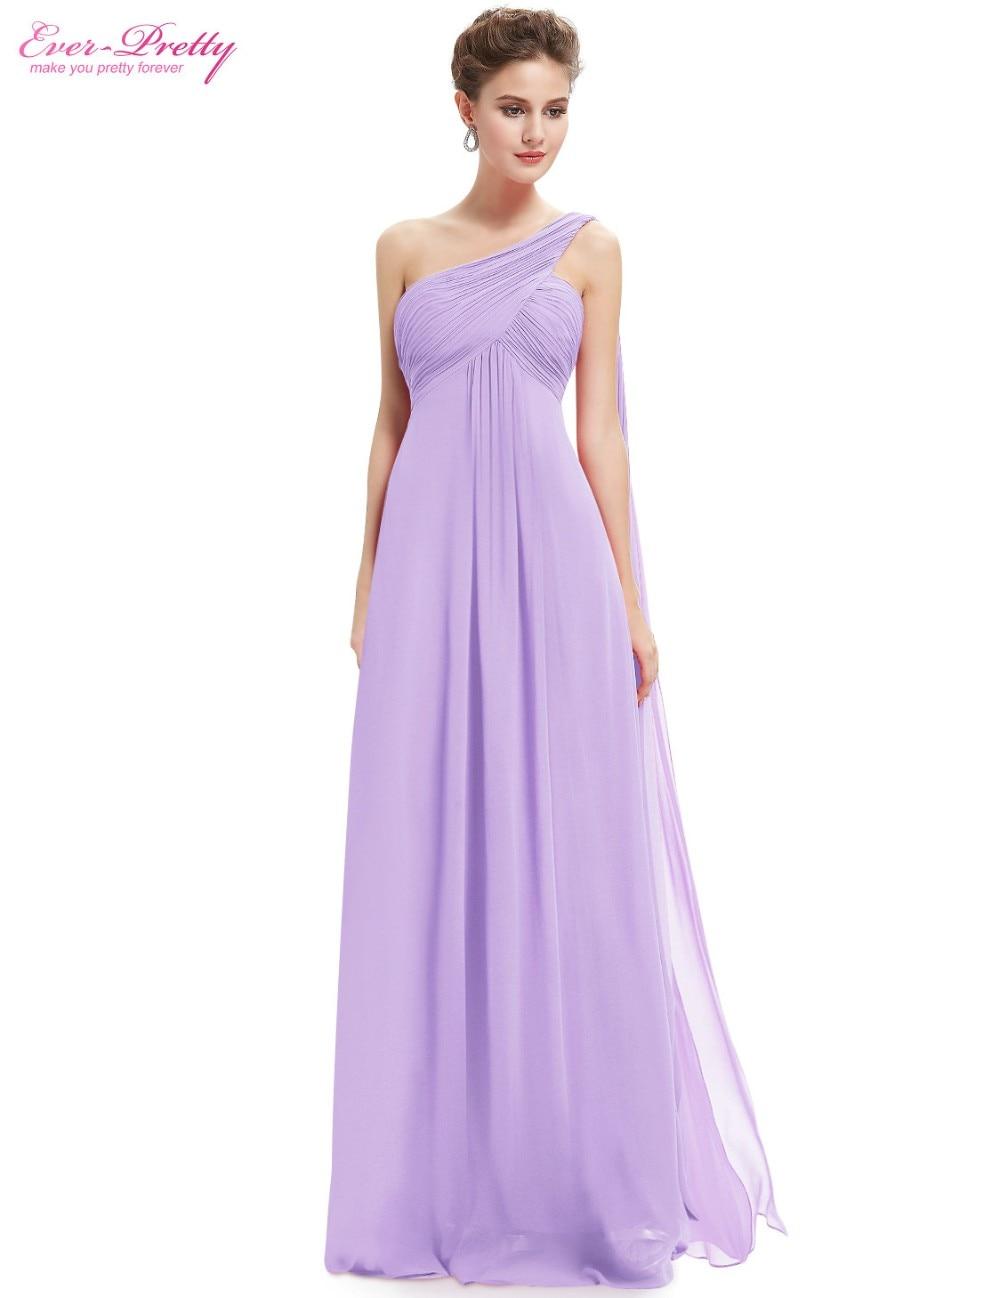 Long train wedding dresses reviews online shopping long for Wedding dresses from china reviews